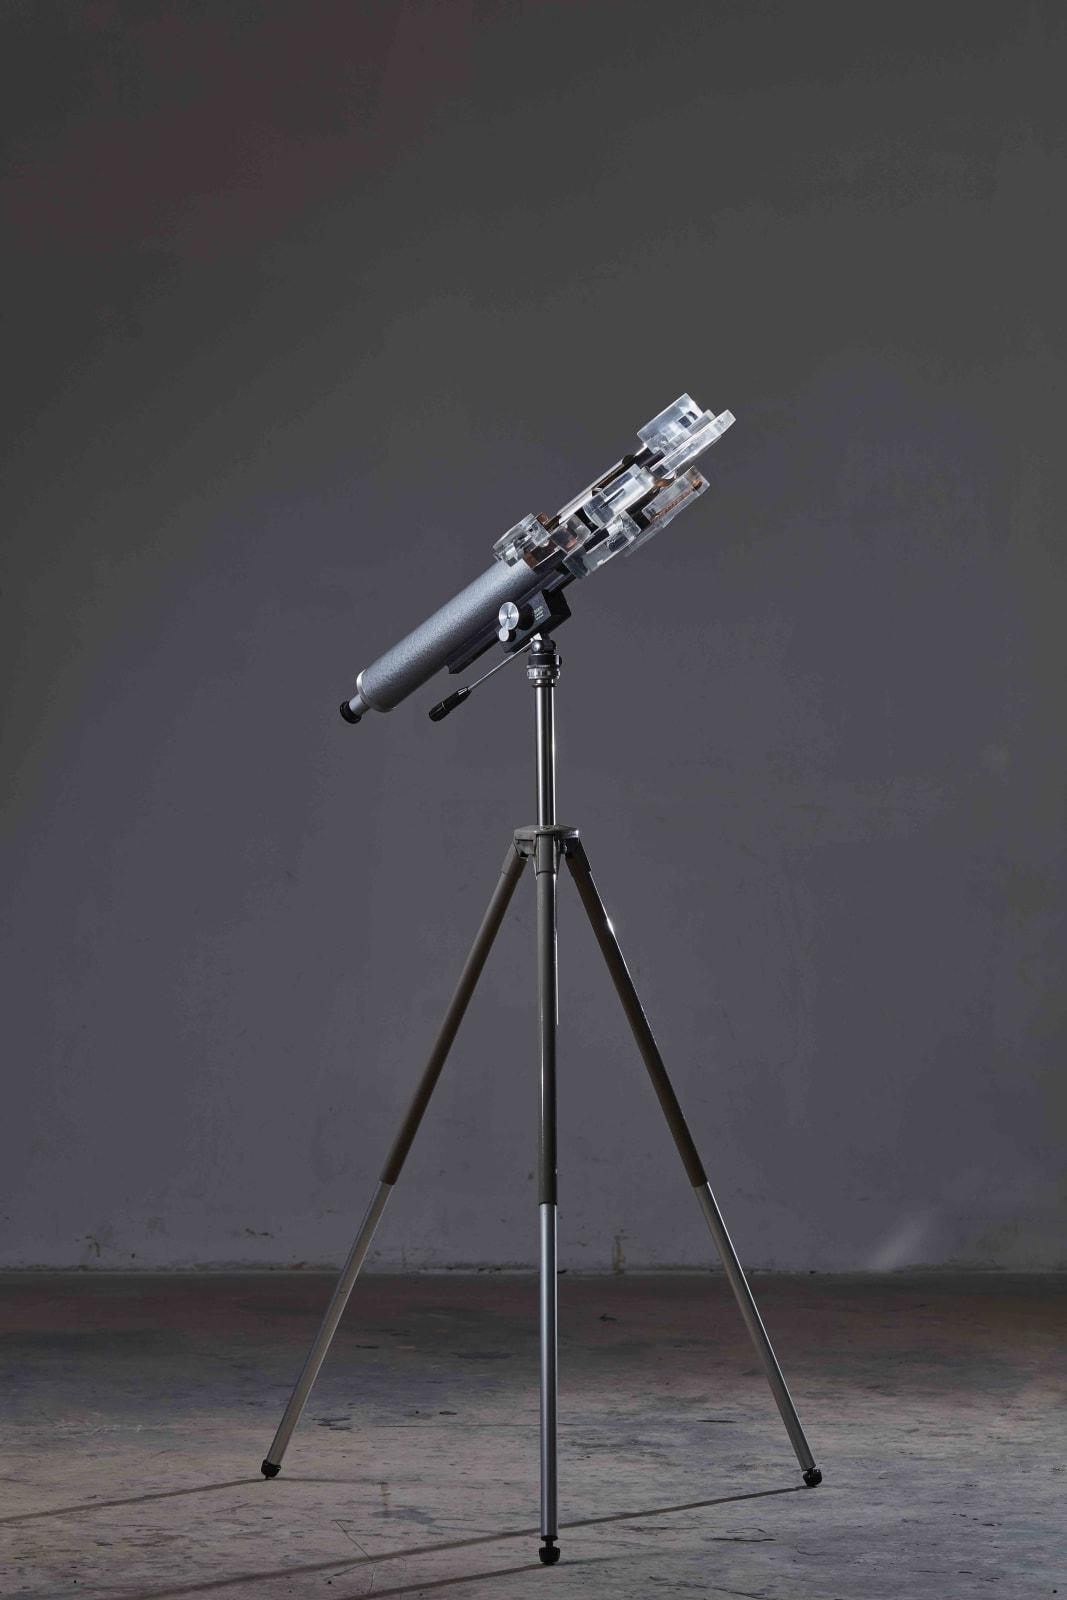 Richard Weisner, I wanted to see it, 2017, telescope, polished resin, cm 80 x 30 x 30, tripod cm 50 x 50 x 70